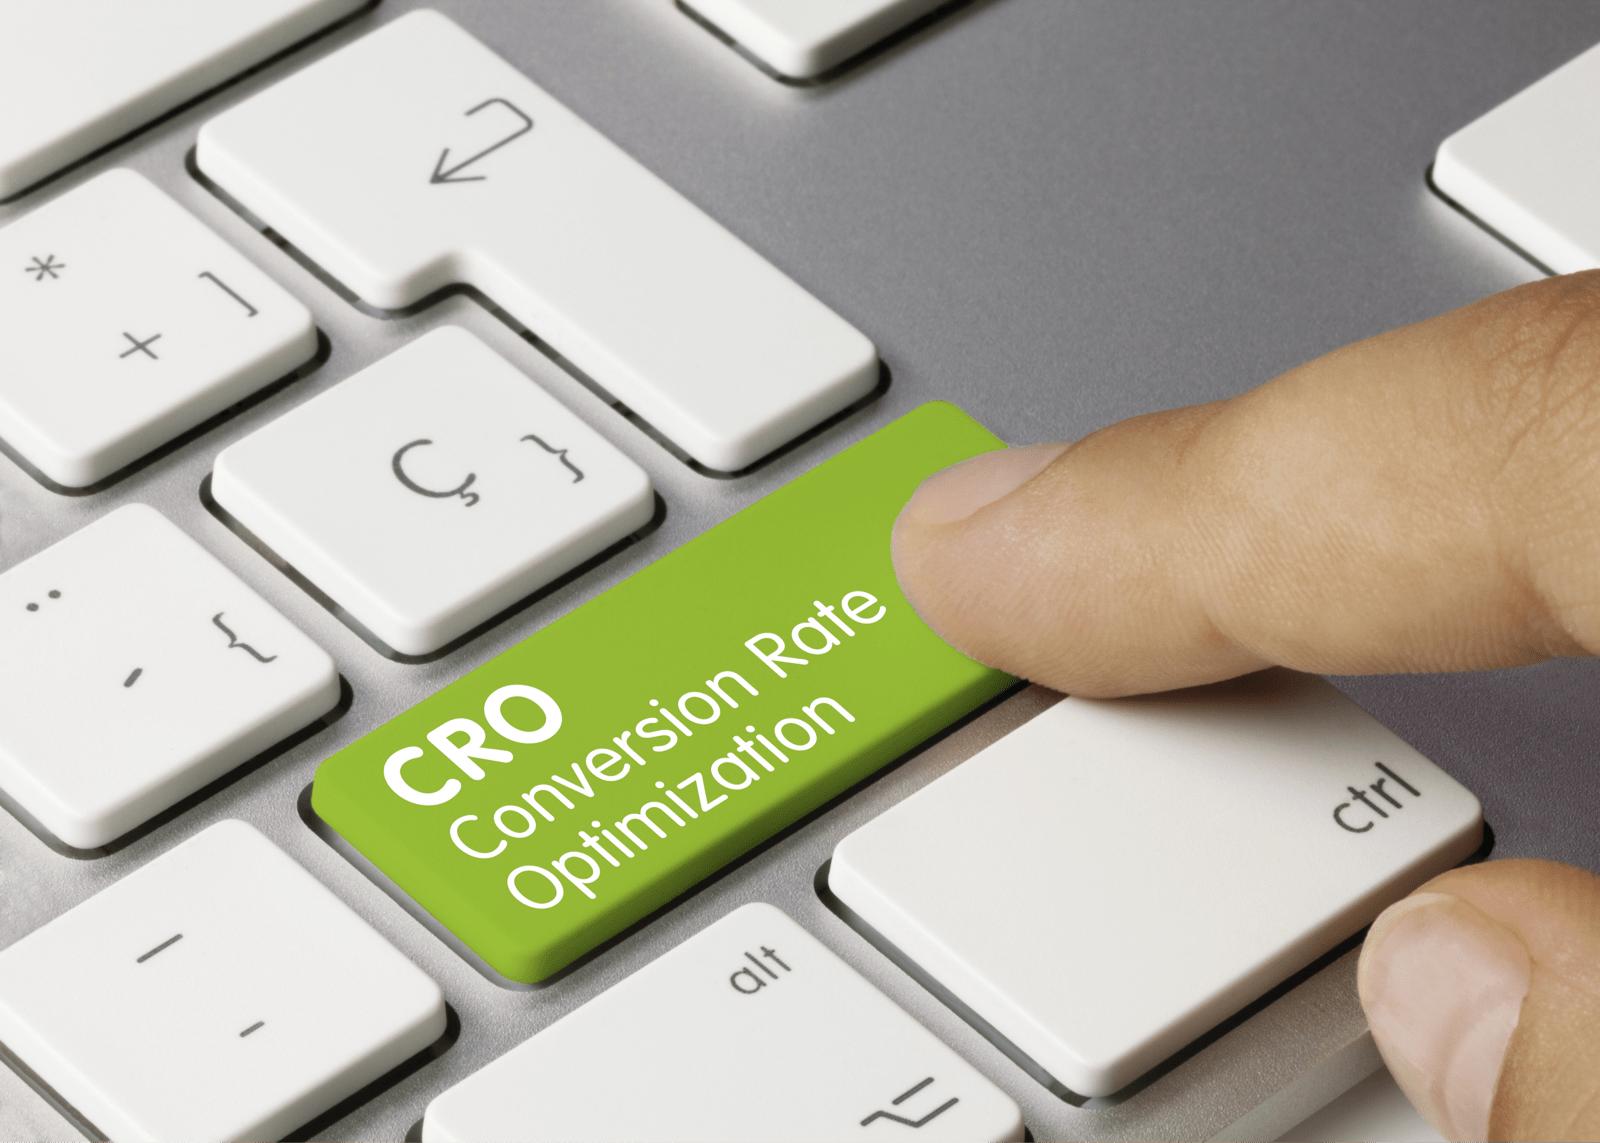 CRO Conversion Rate Optimizationと書かれたキー